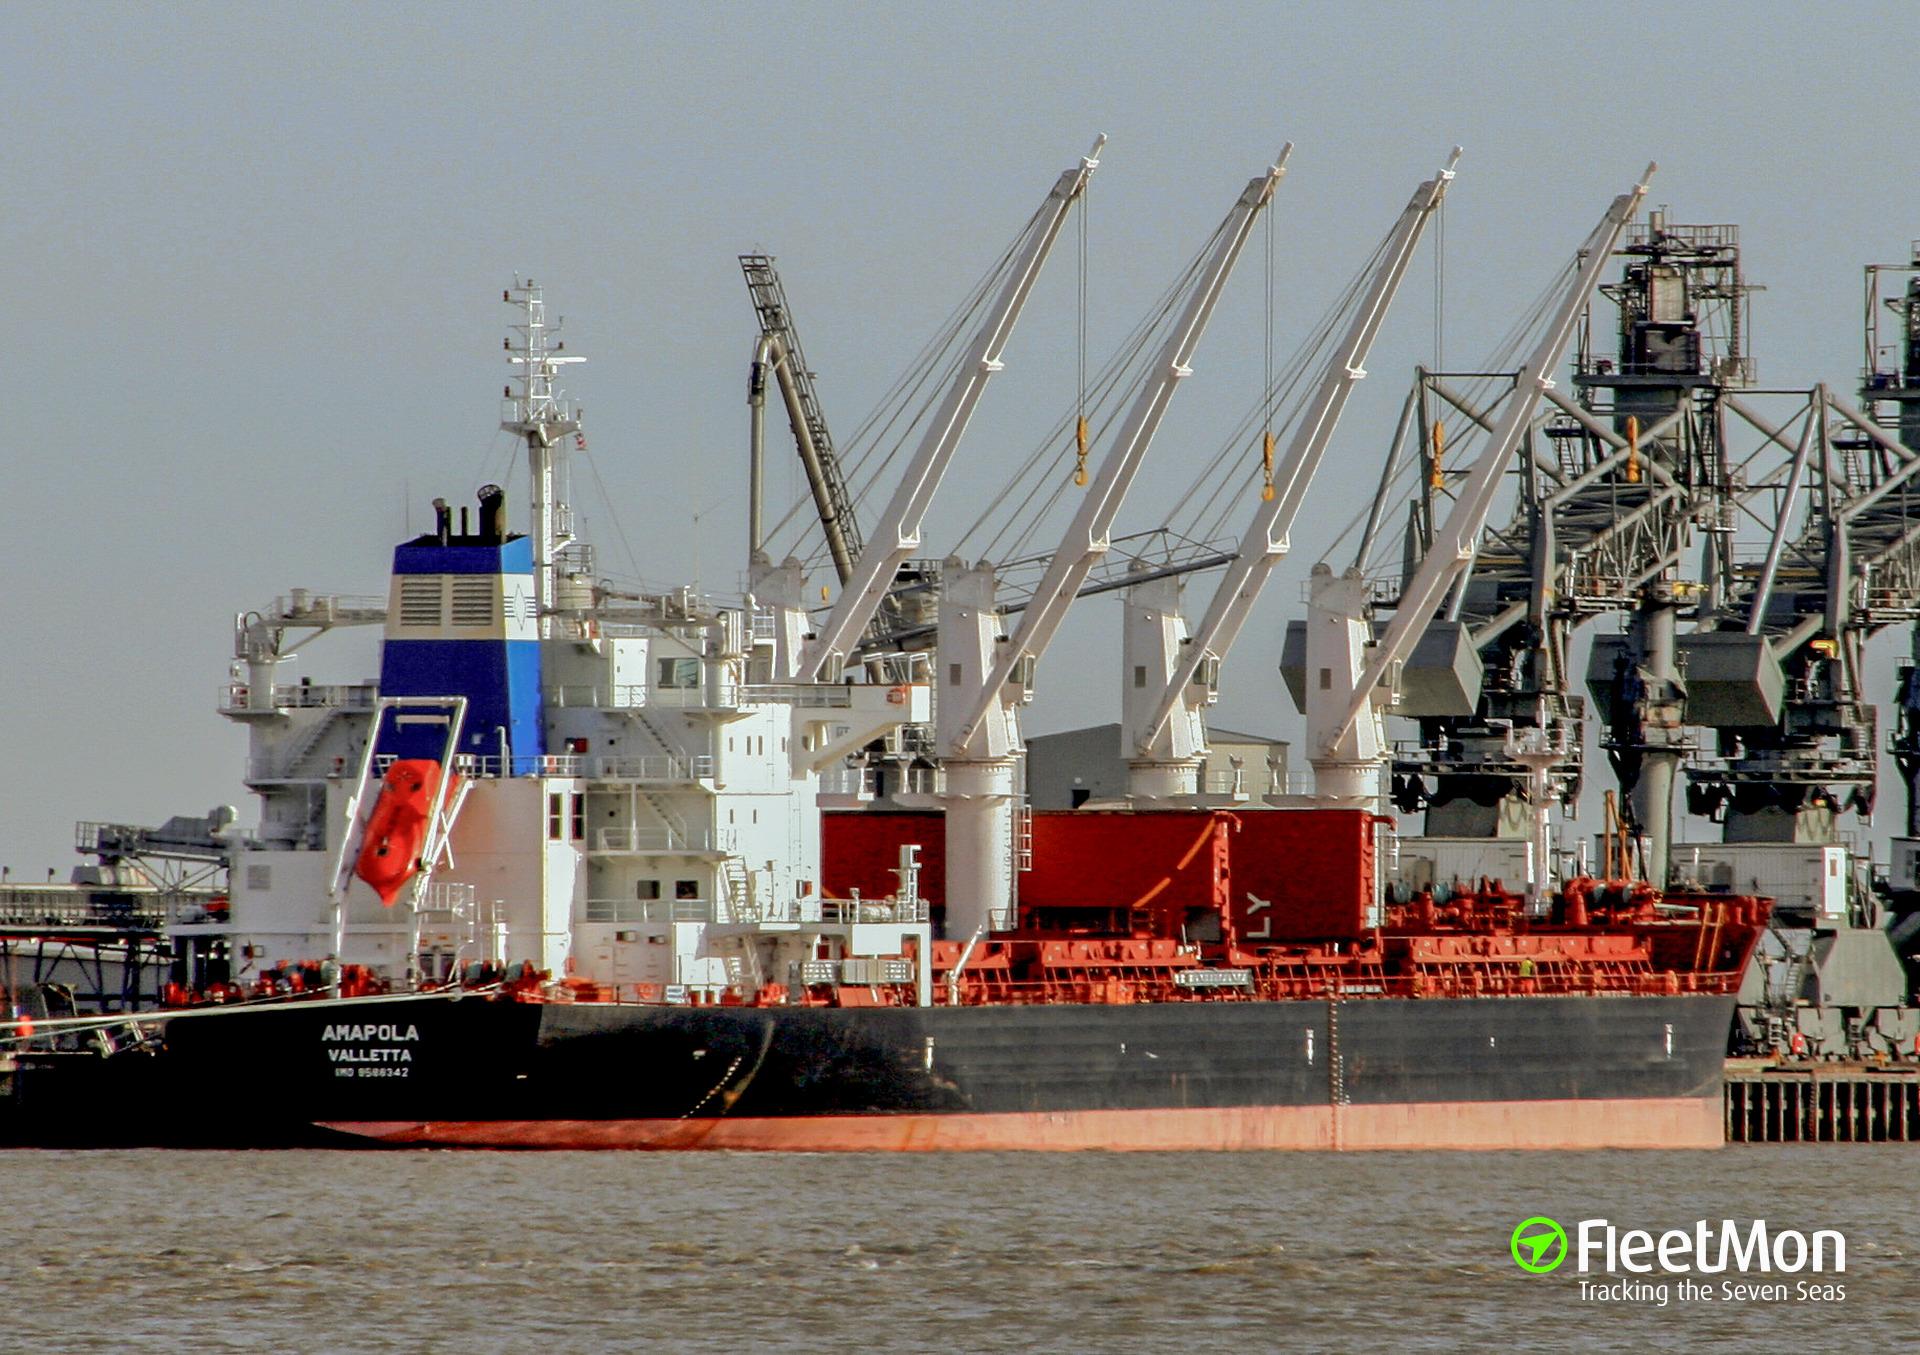 Bulk carrier AMAPOLA two crew dead